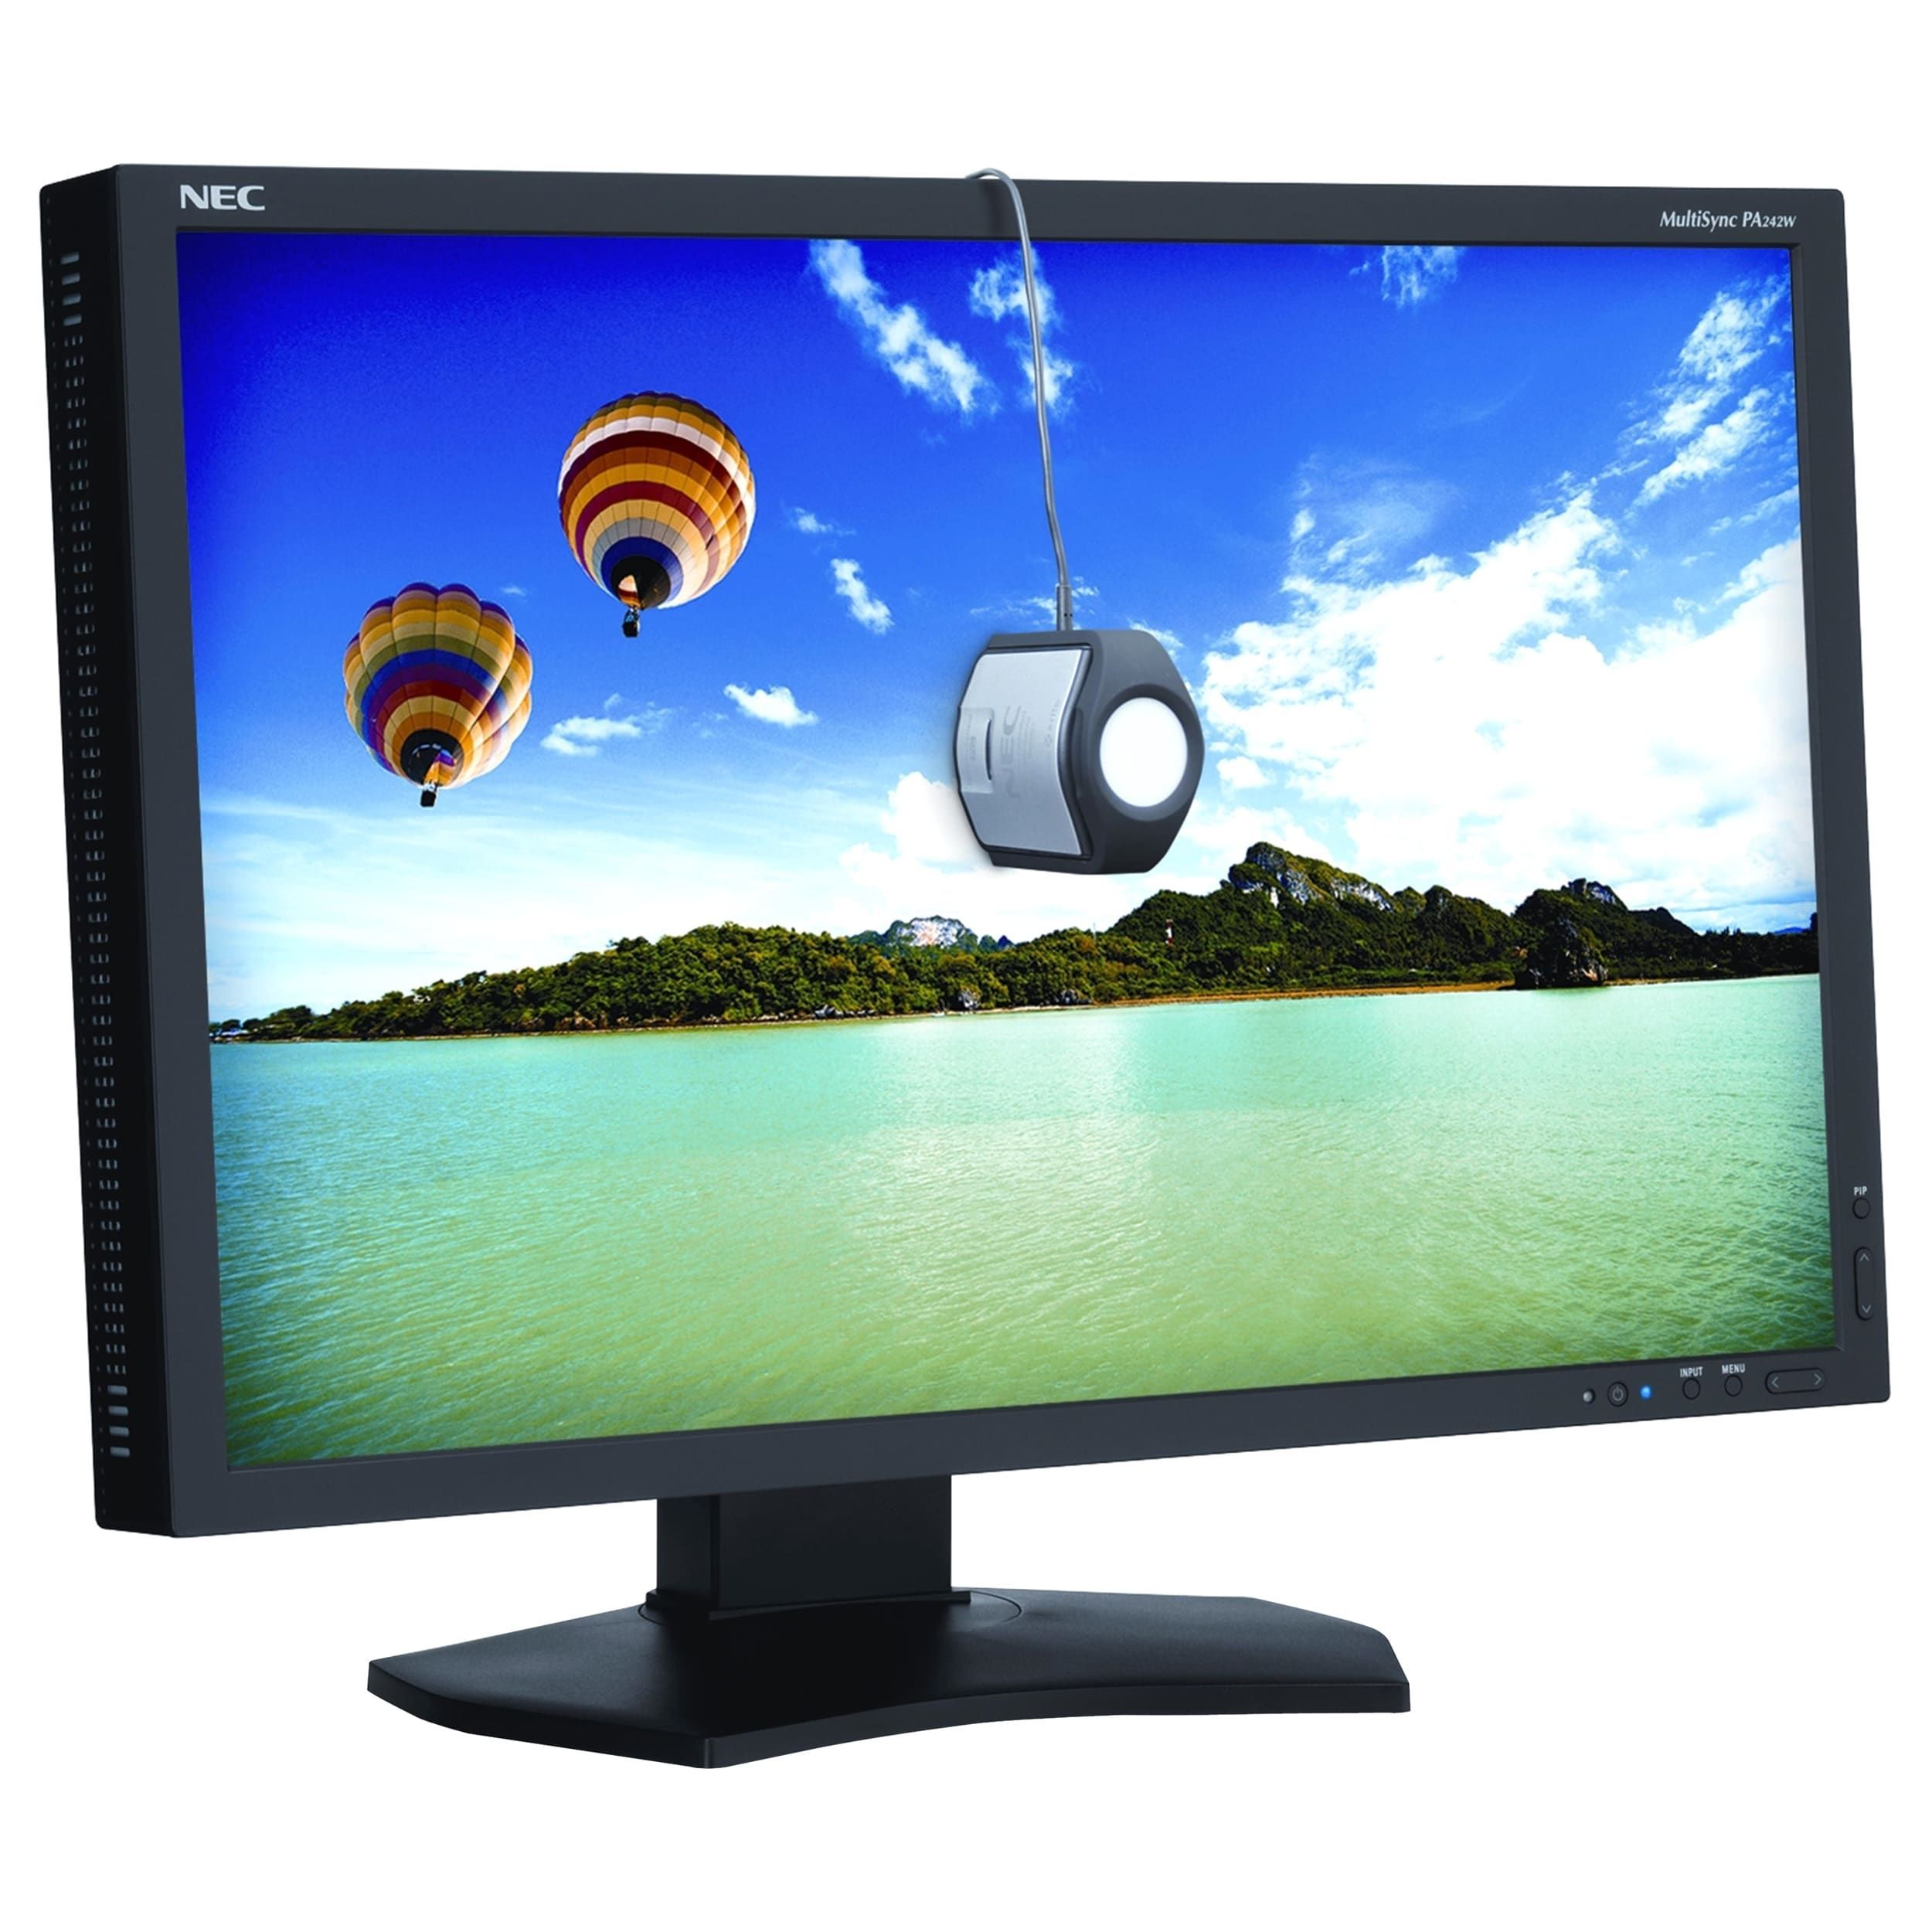 NEC Display PA242W BK SV 241 LED LCD Monitor